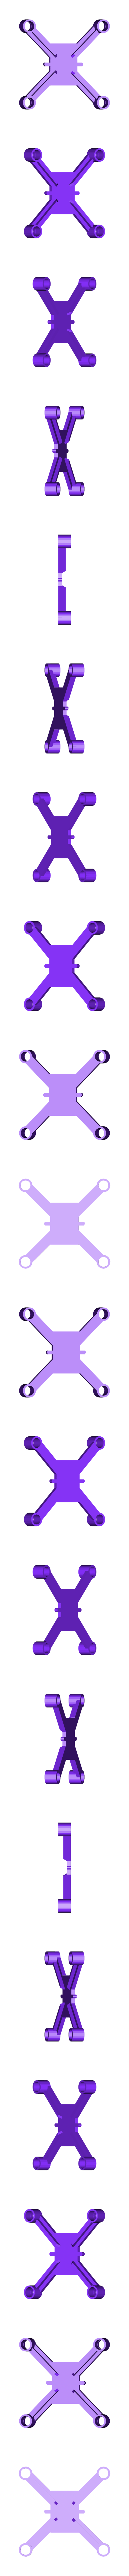 dronedrame_8mm_motors_lite.stl Download free STL file Drone Frame for all motor sizes ! - 6mm,6.5mm,7mm,7.5mm,8mm,8.5mm • 3D printable model, Gophy